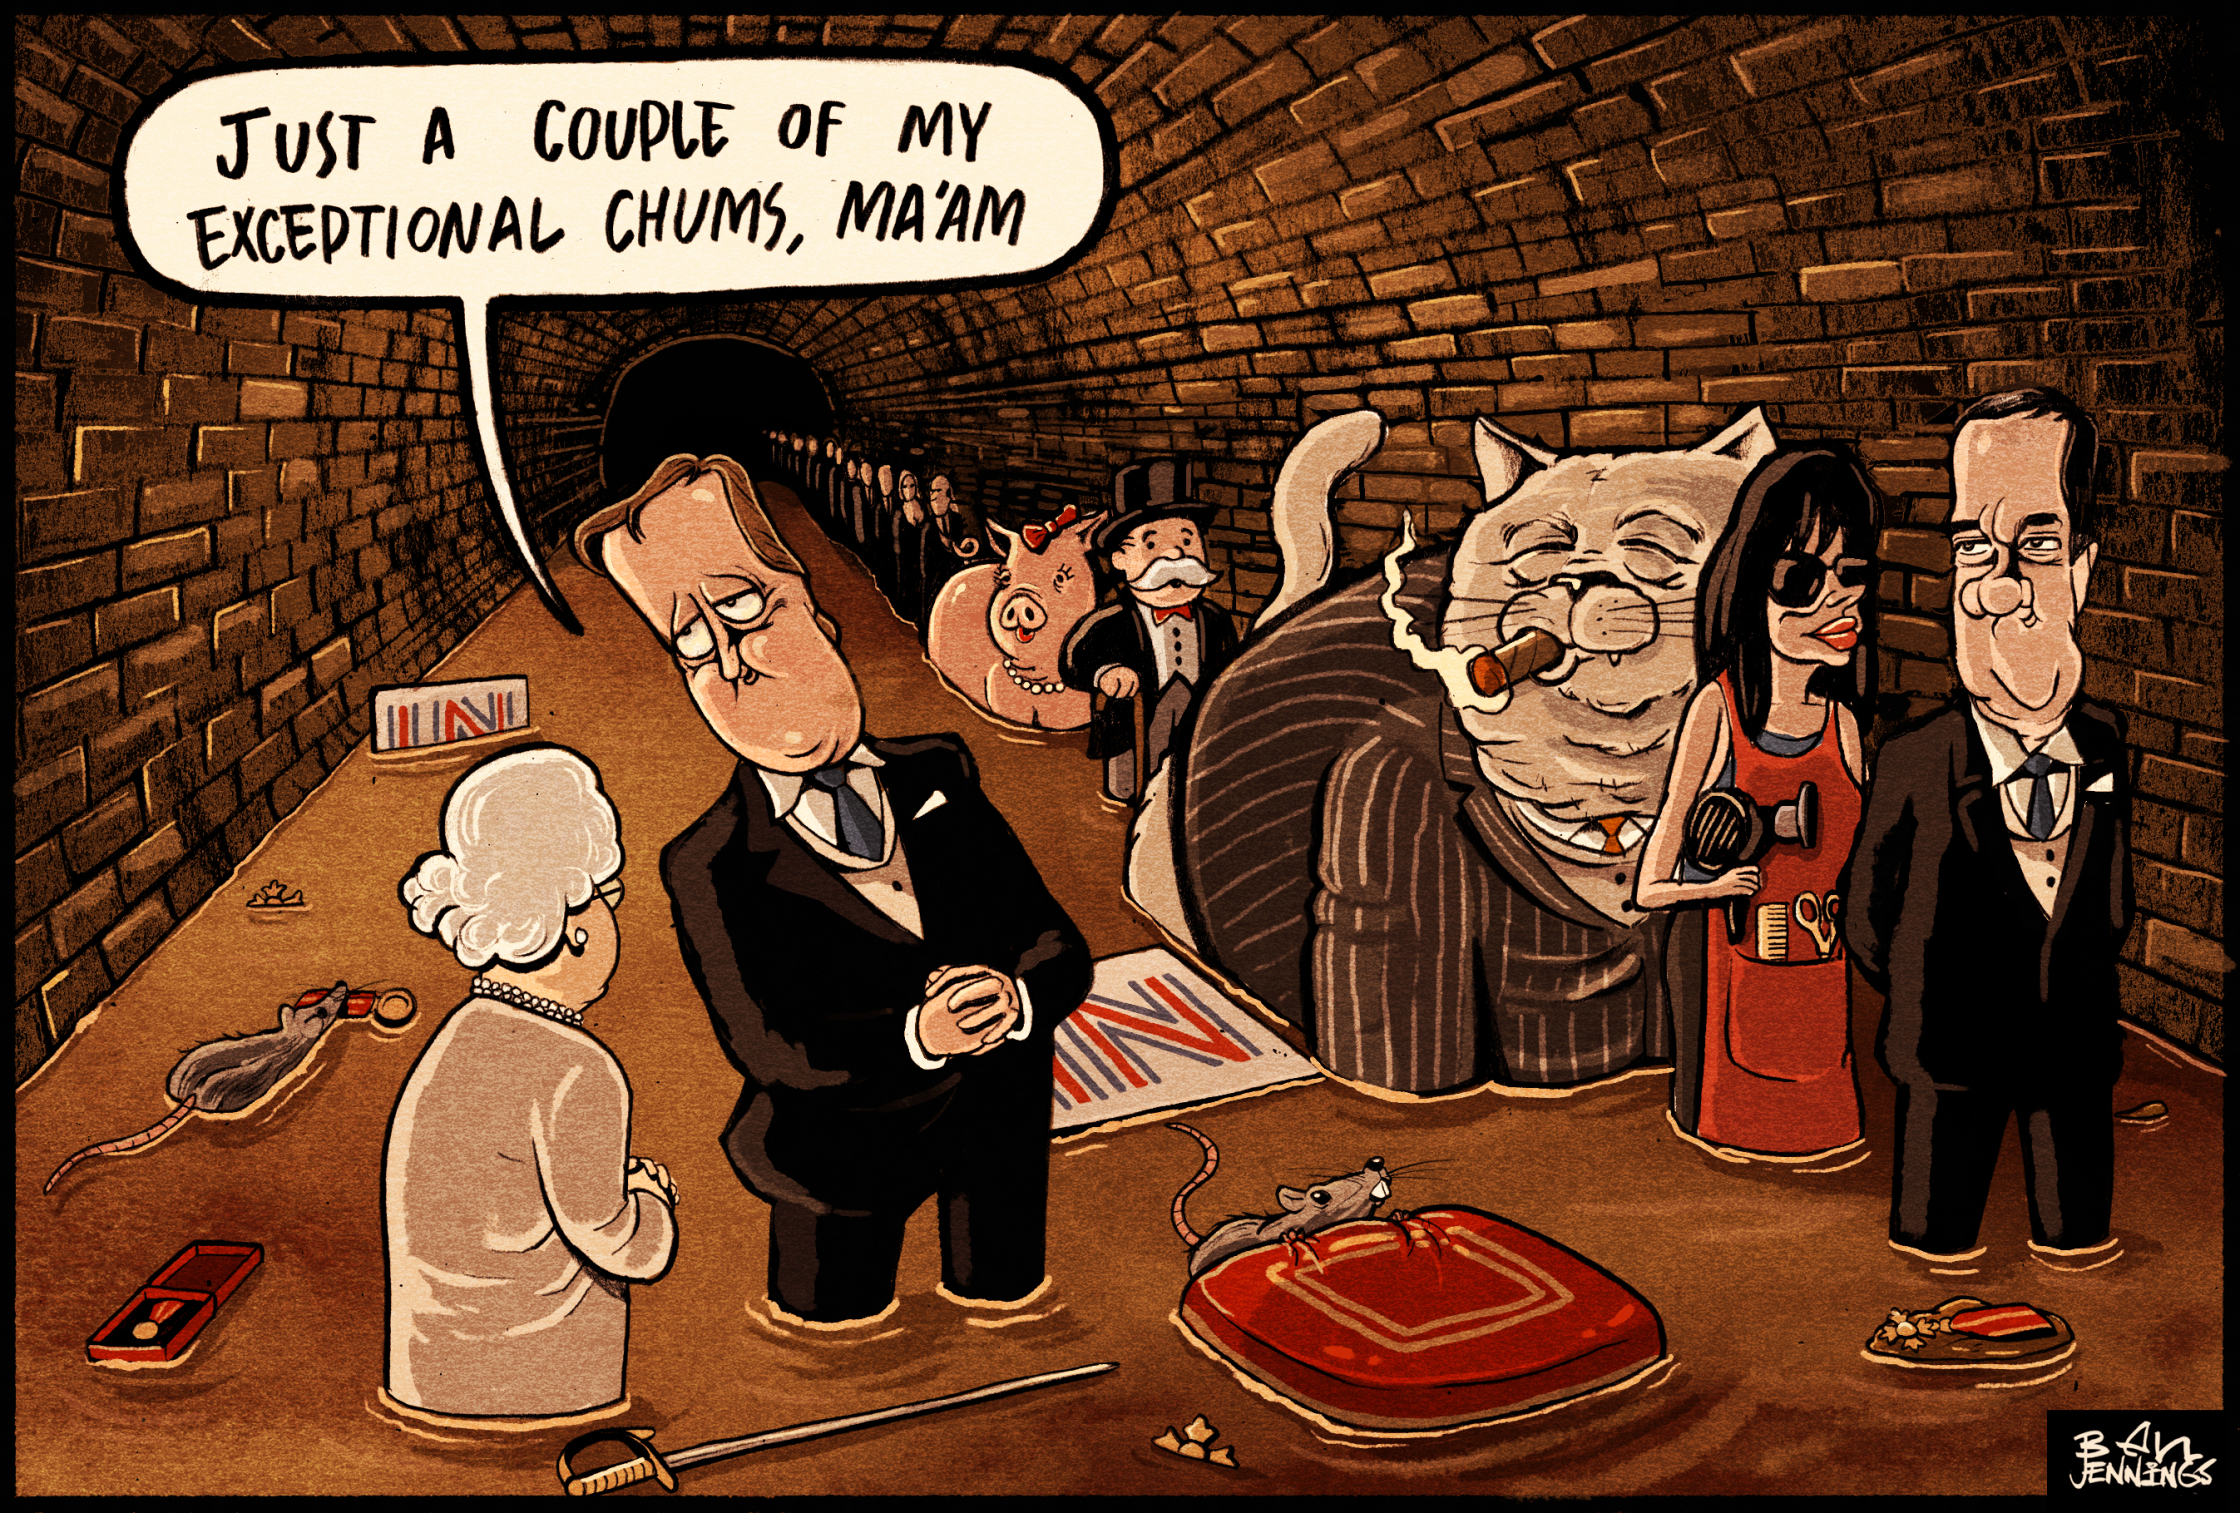 BenJennings_OpinionCartoon_02.08.16.jpg